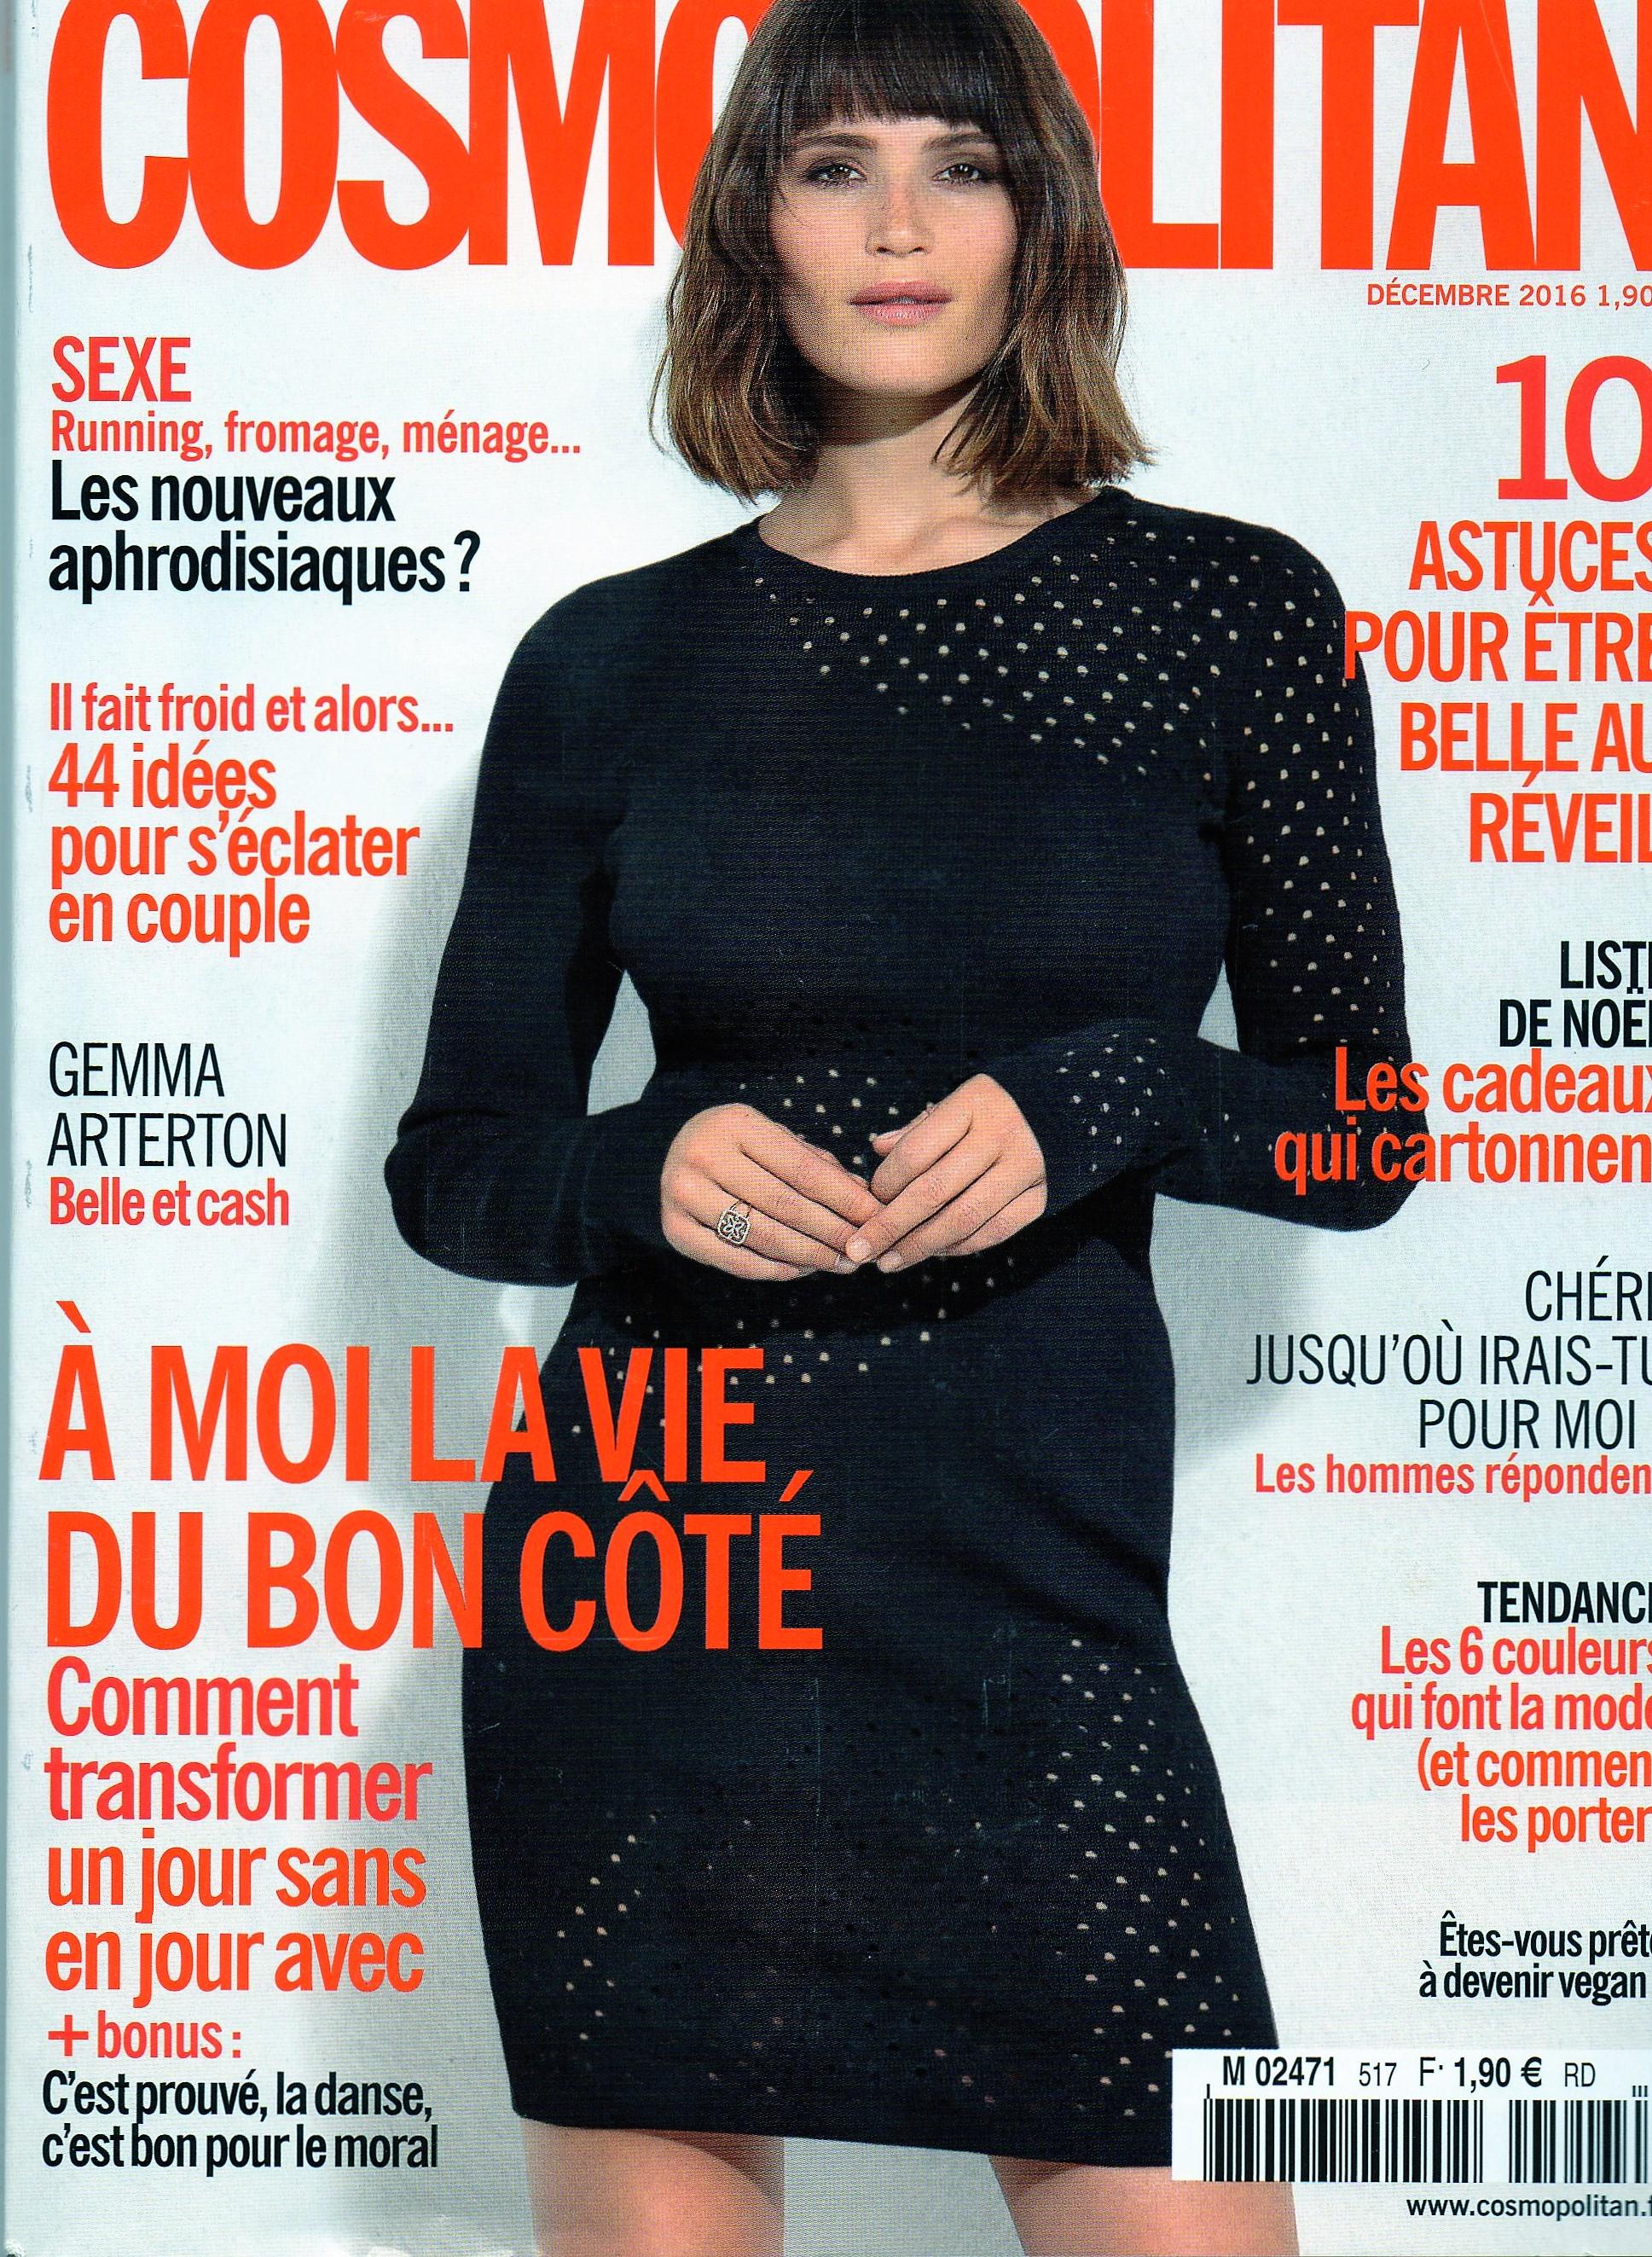 Cosmopolitan Decembre 2016 Cover